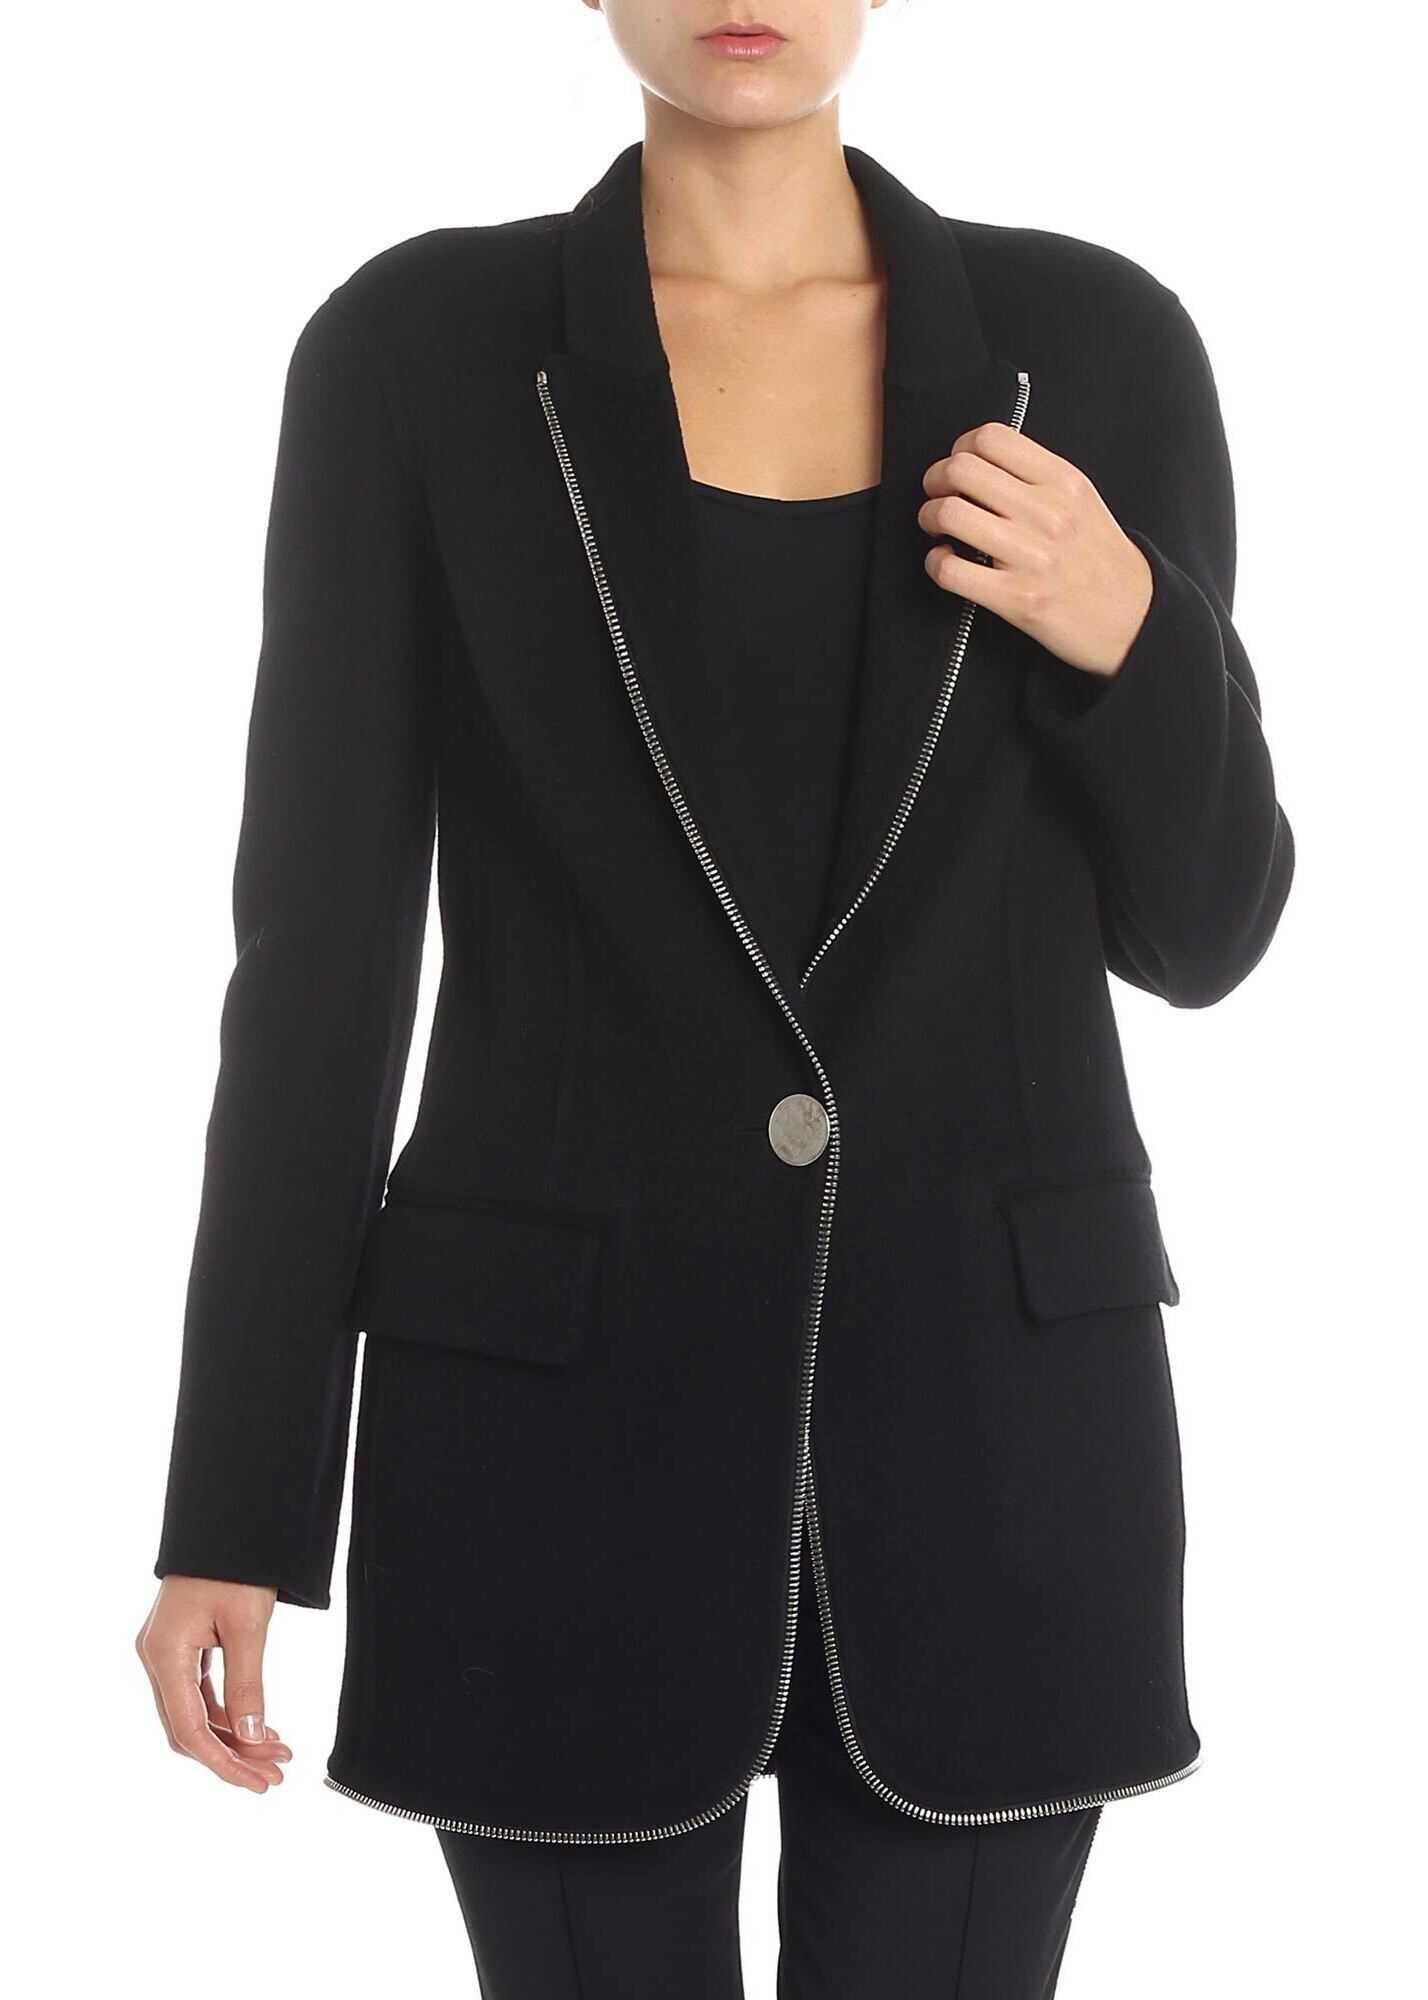 Alexander Wang Black Coat With Applied Zip Black